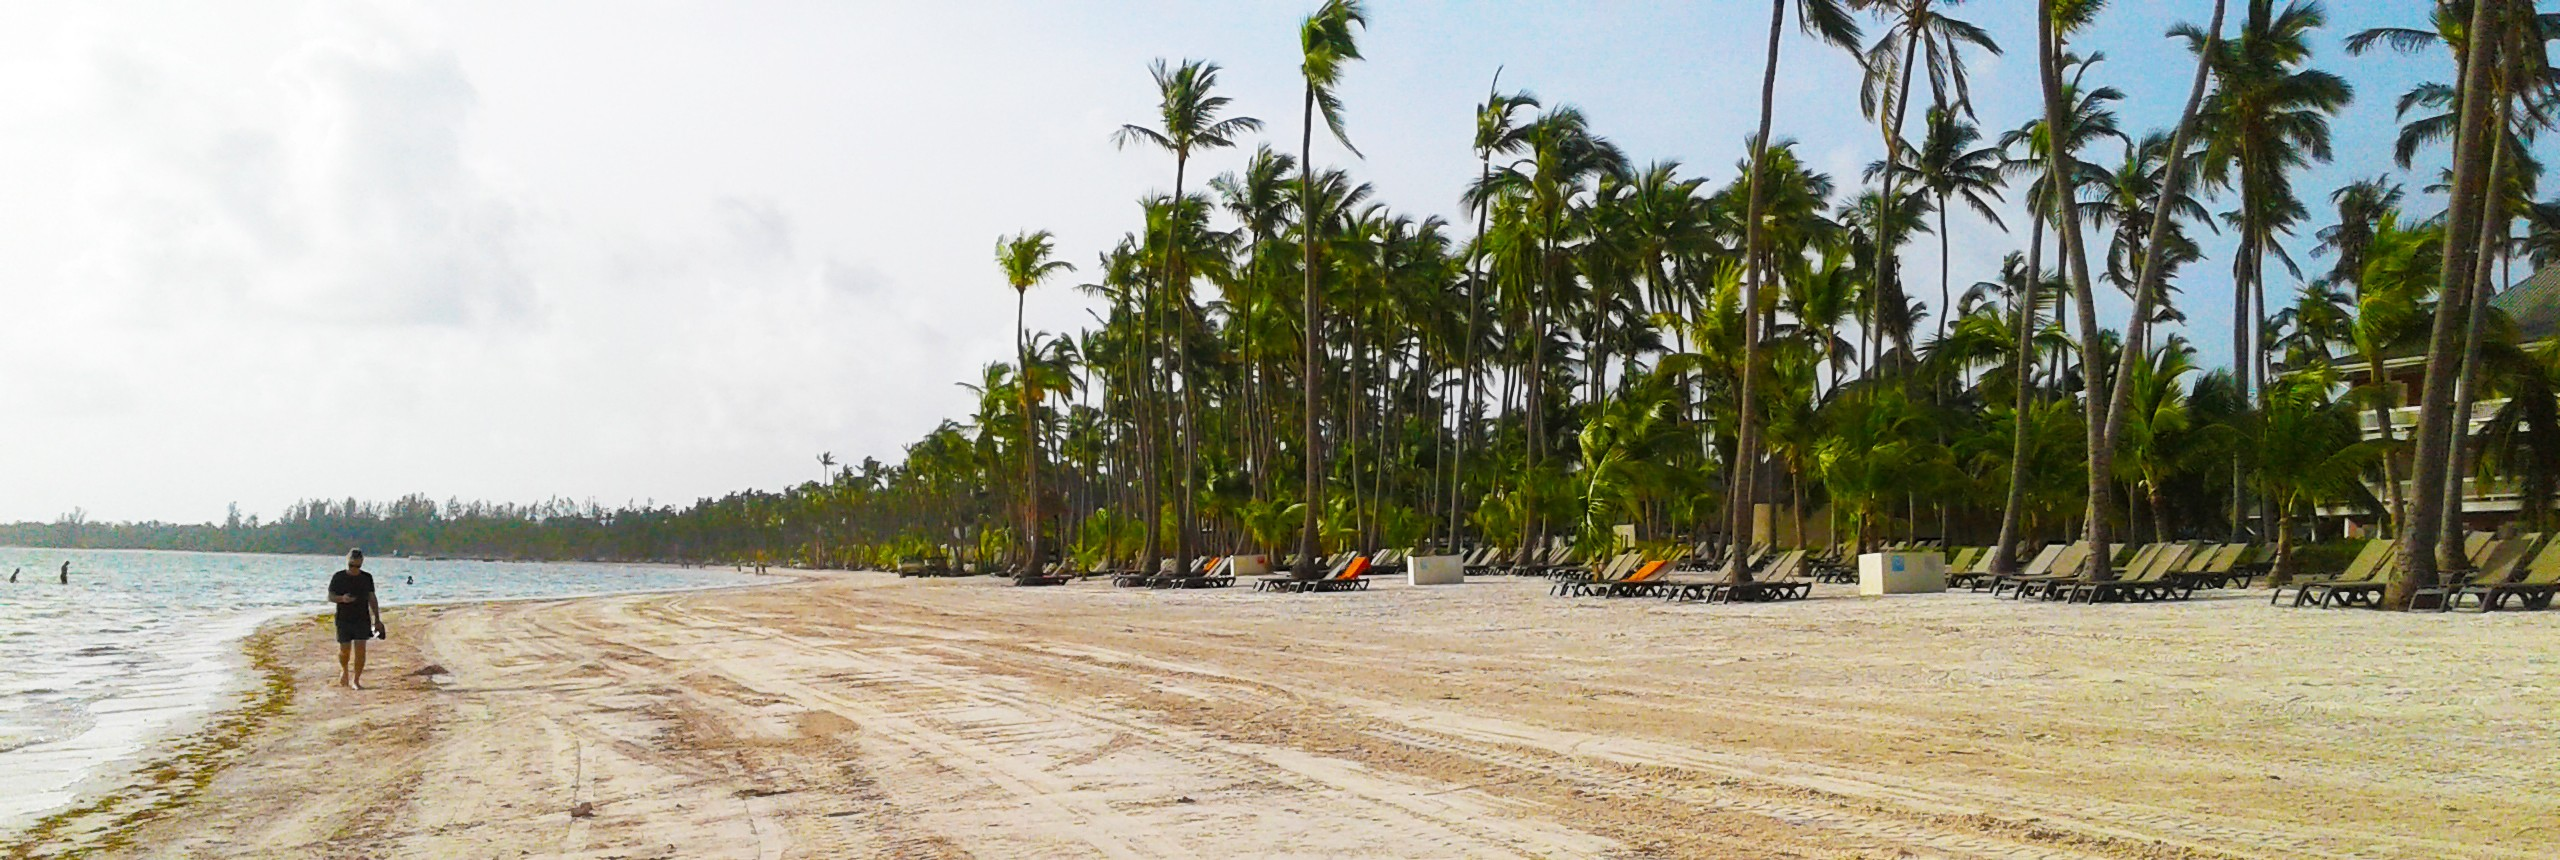 Beautiful beaches in Punta Cana, Dominican Republic